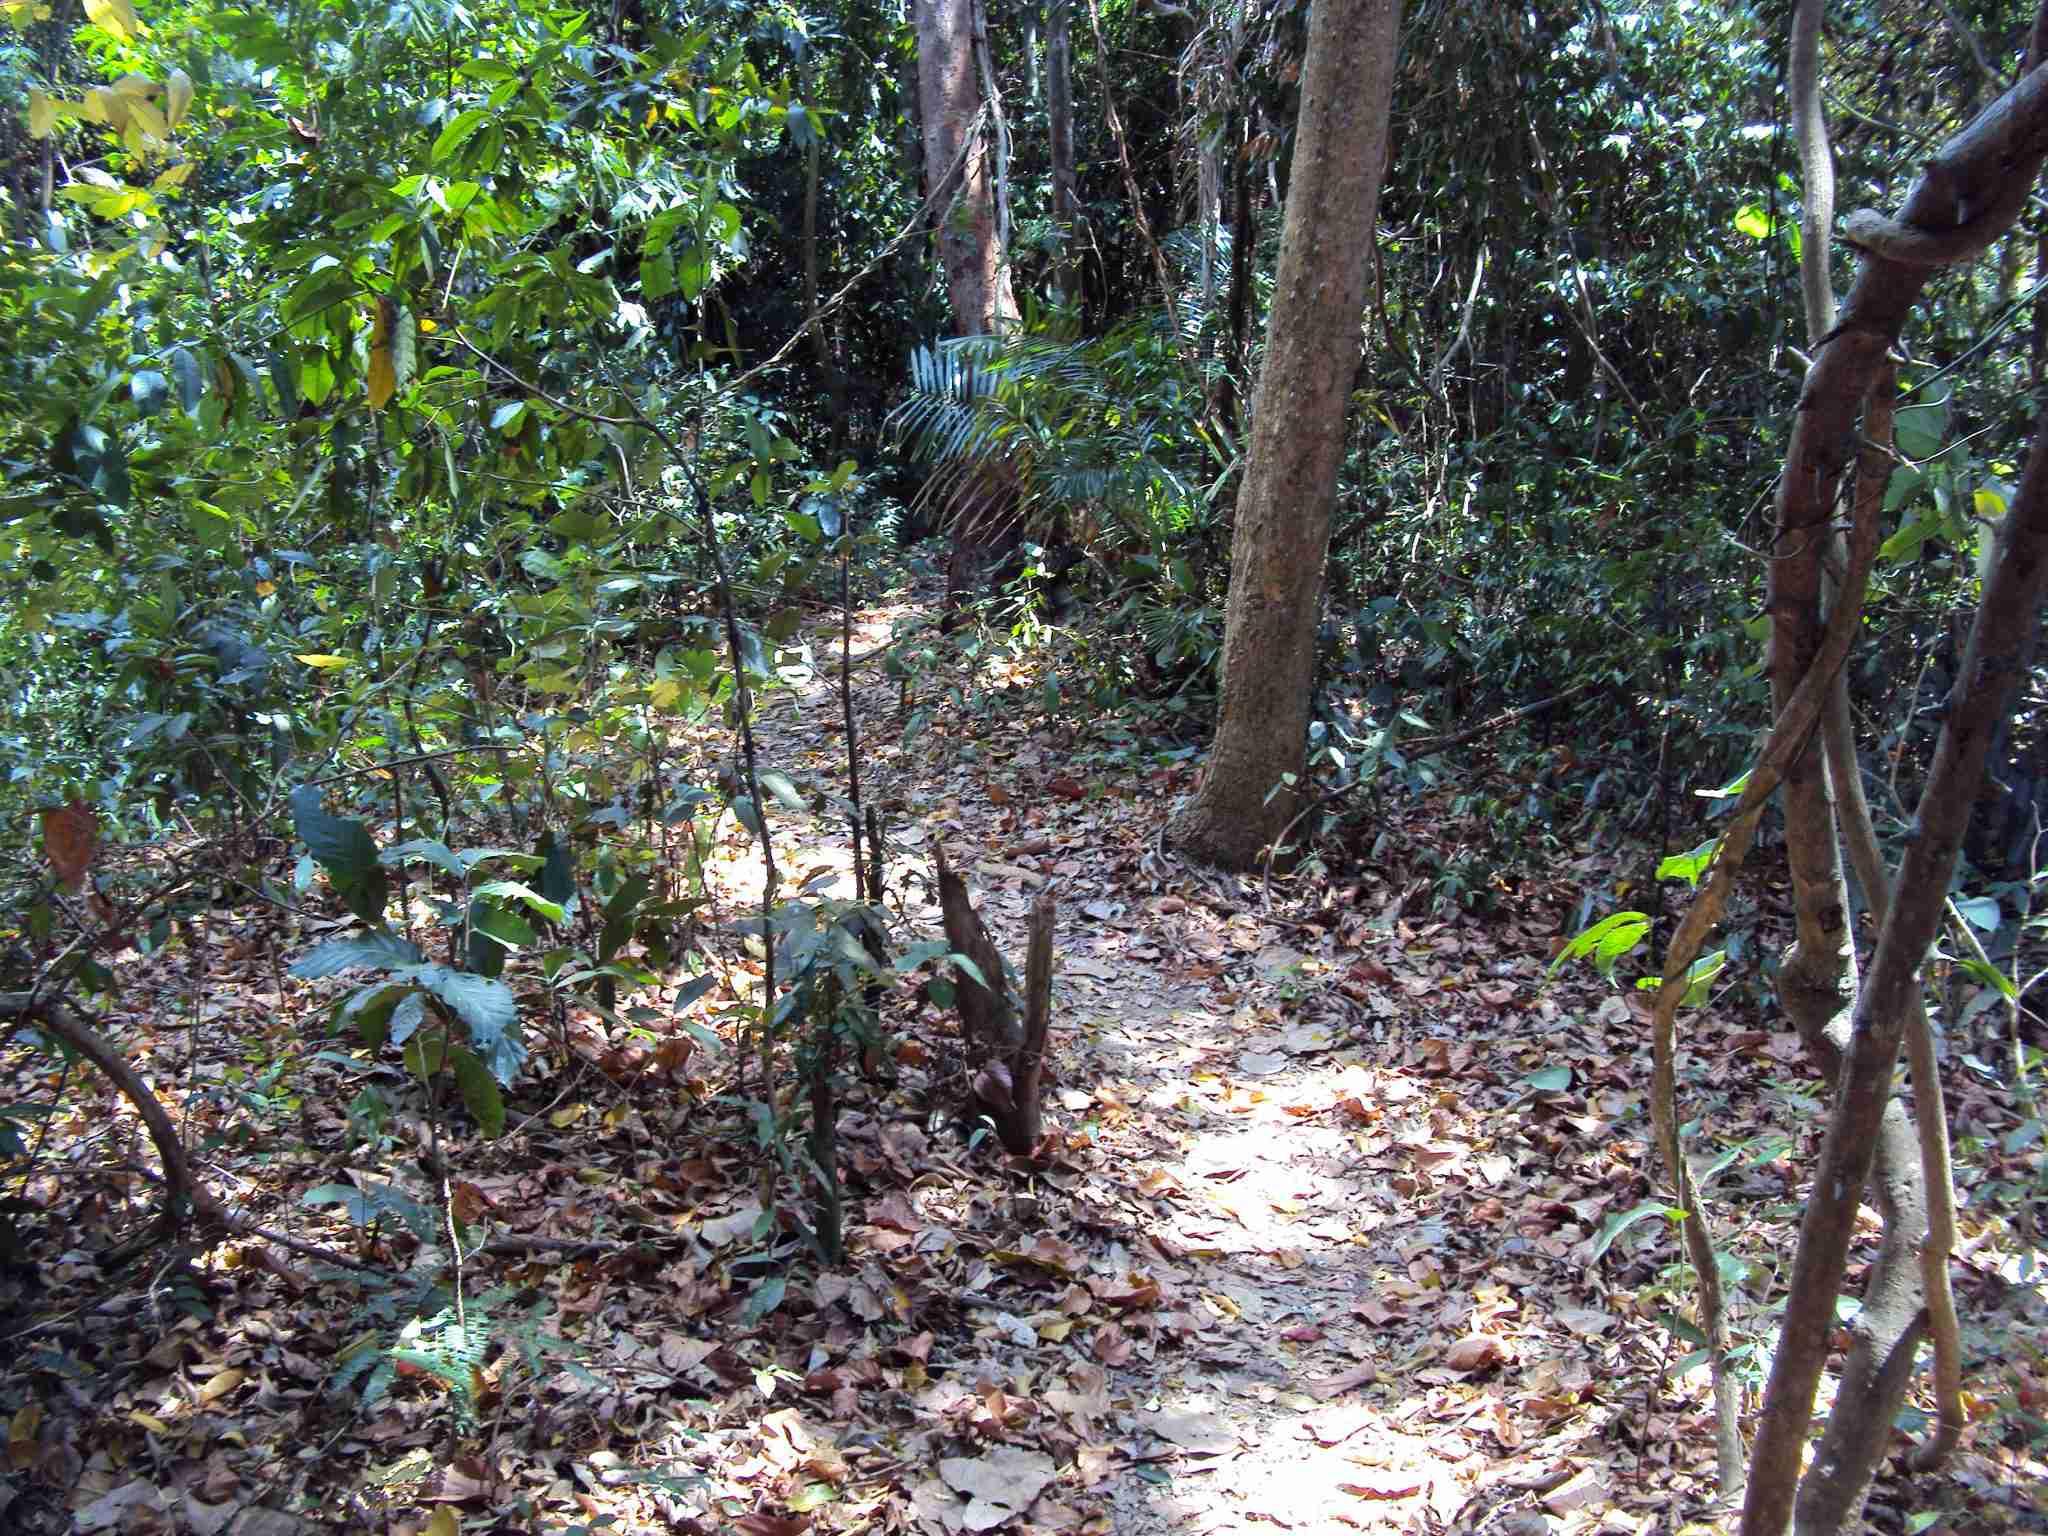 The path gets narrow